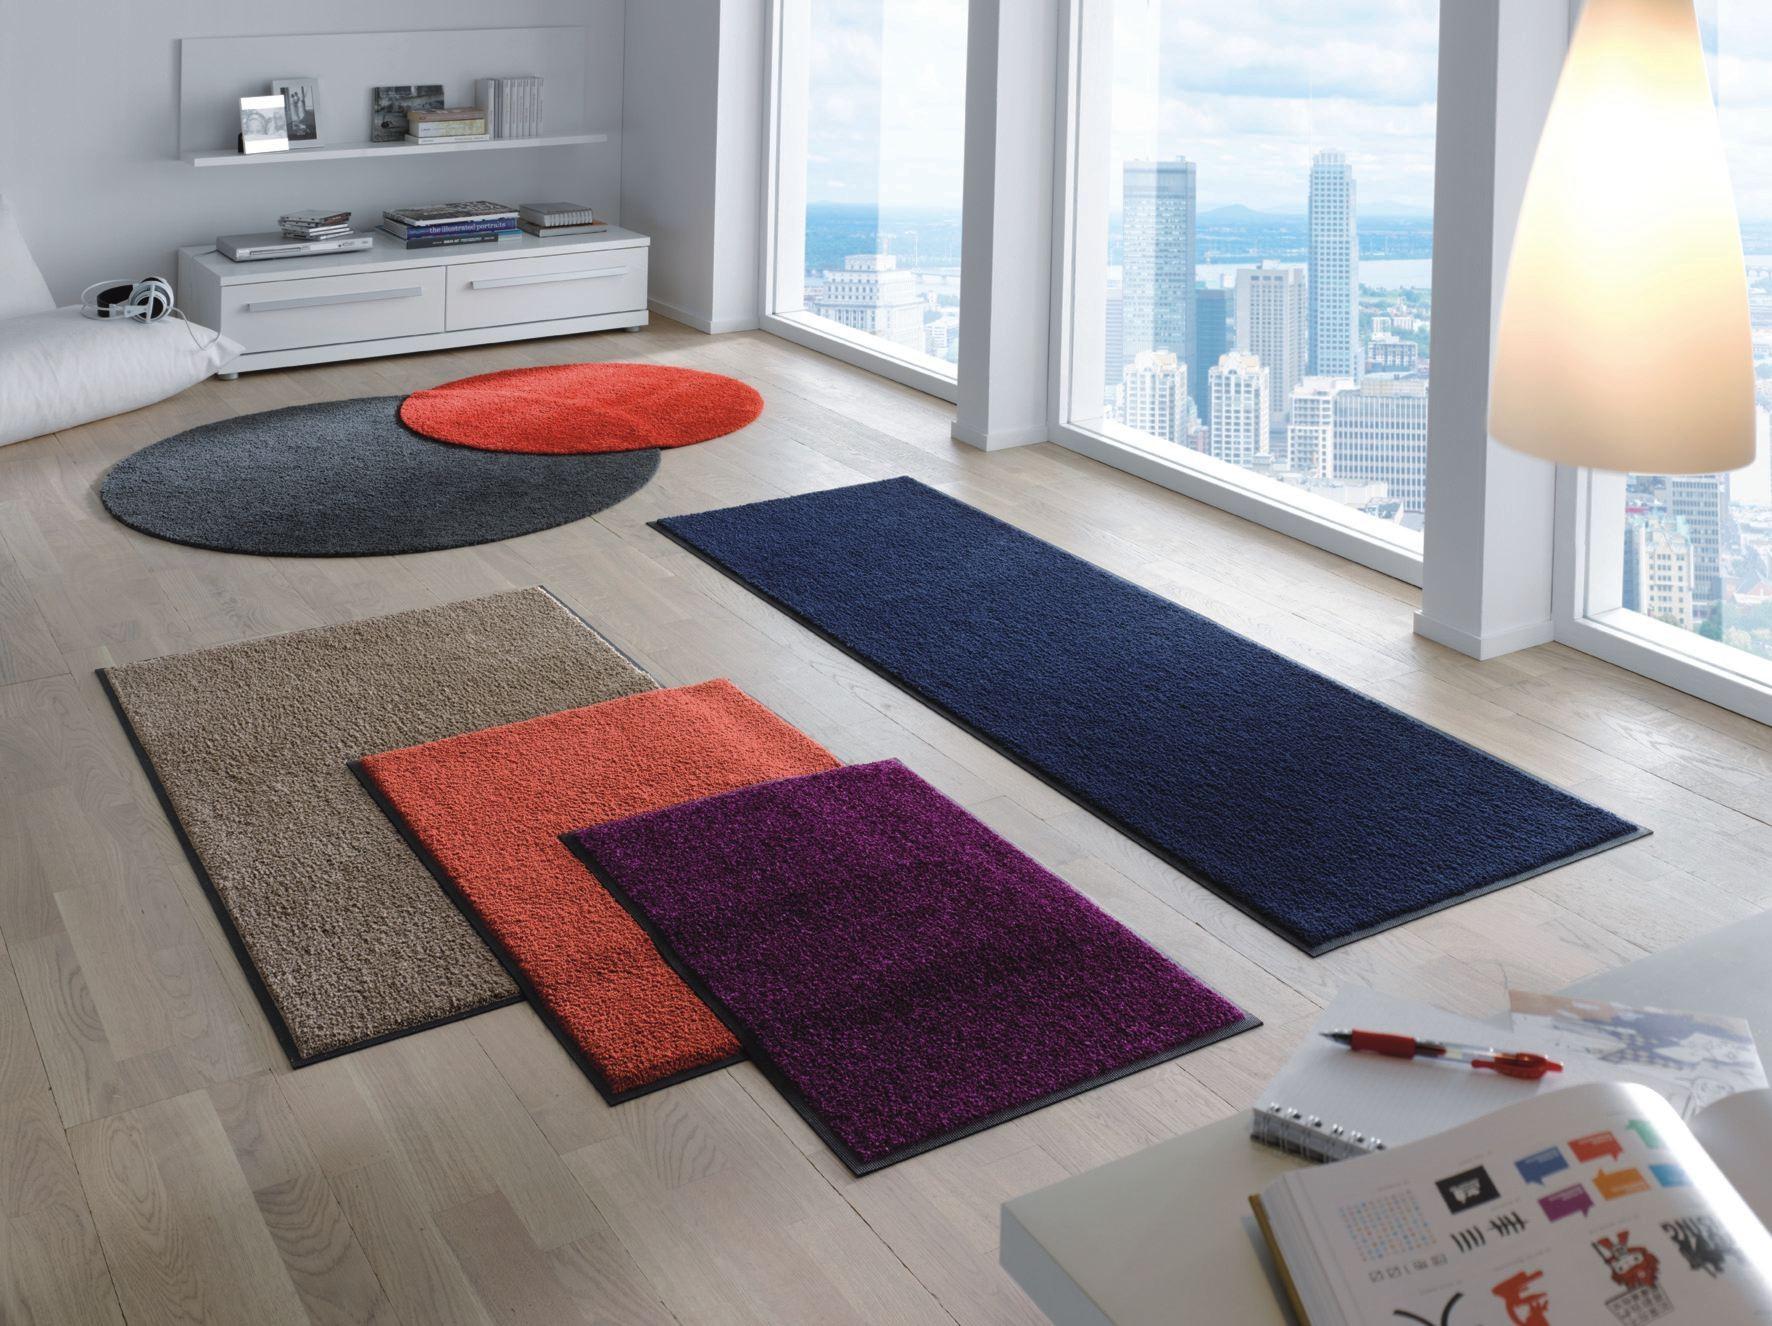 wash dry fu matte smokey mount waschbare fu matte anthrazit. Black Bedroom Furniture Sets. Home Design Ideas